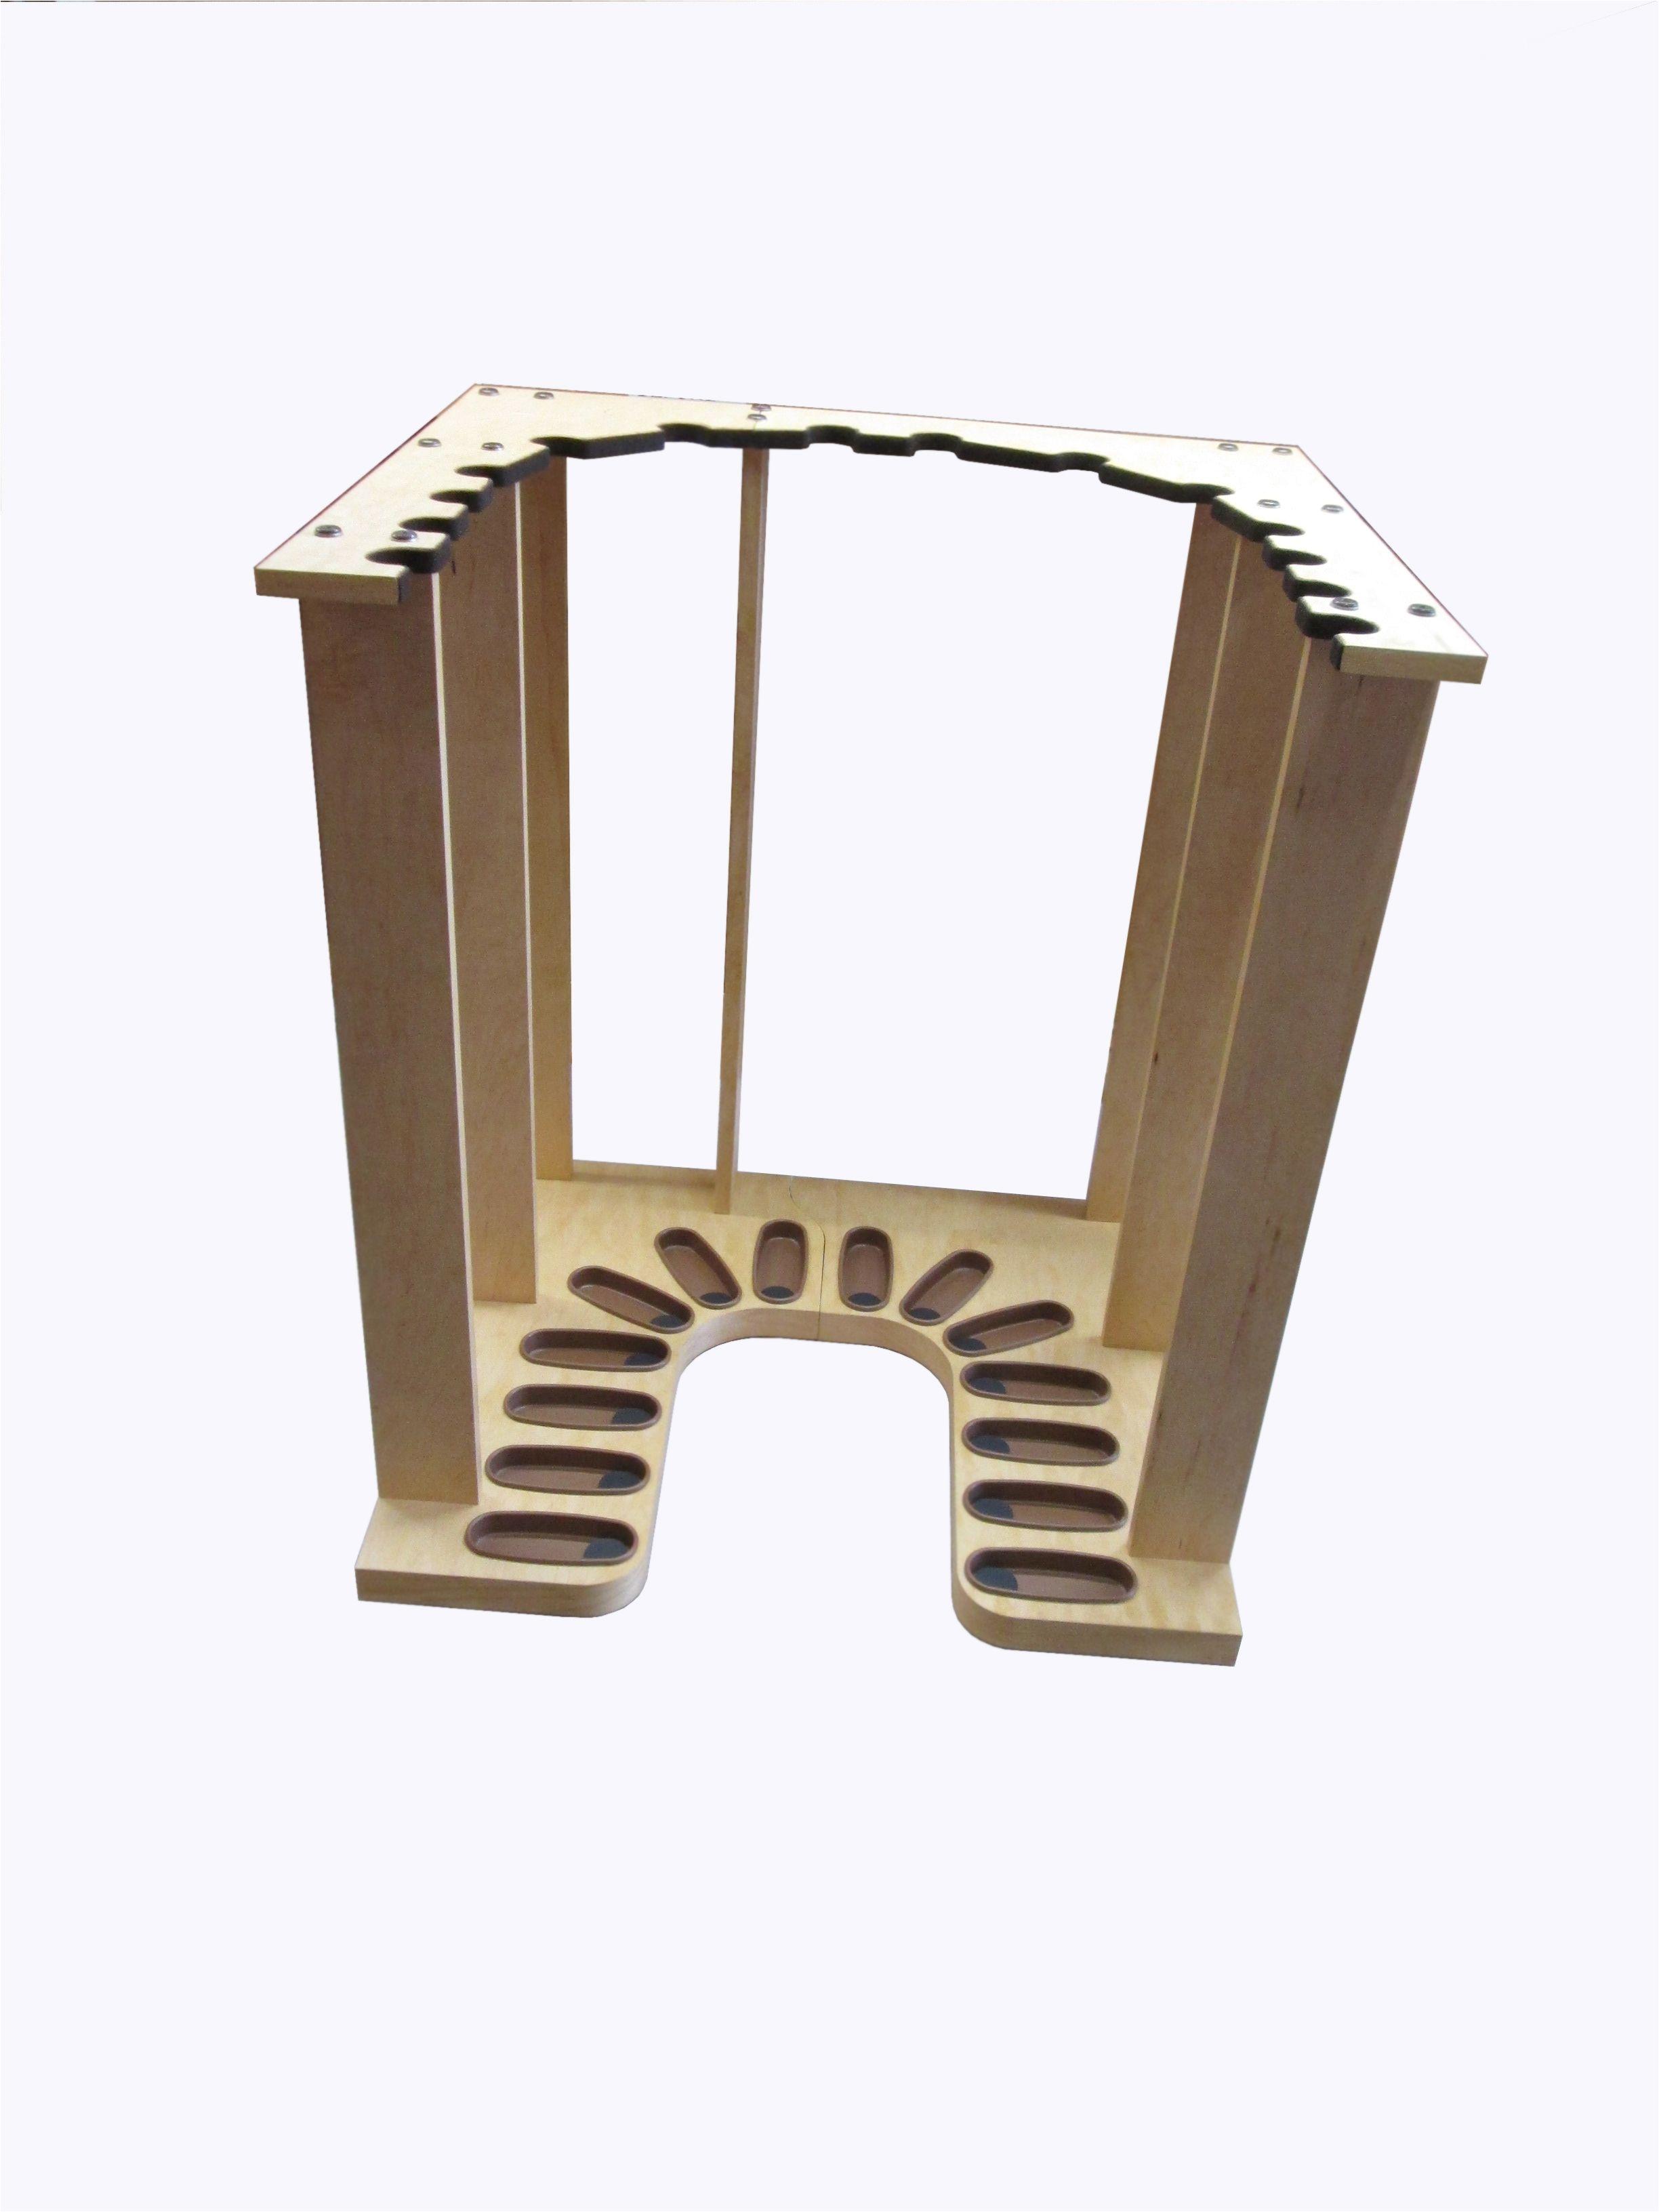 Safety Nets for Racking U Shaped Vertical Gun Rack for A Safe or Closet Www Gun Racks Com